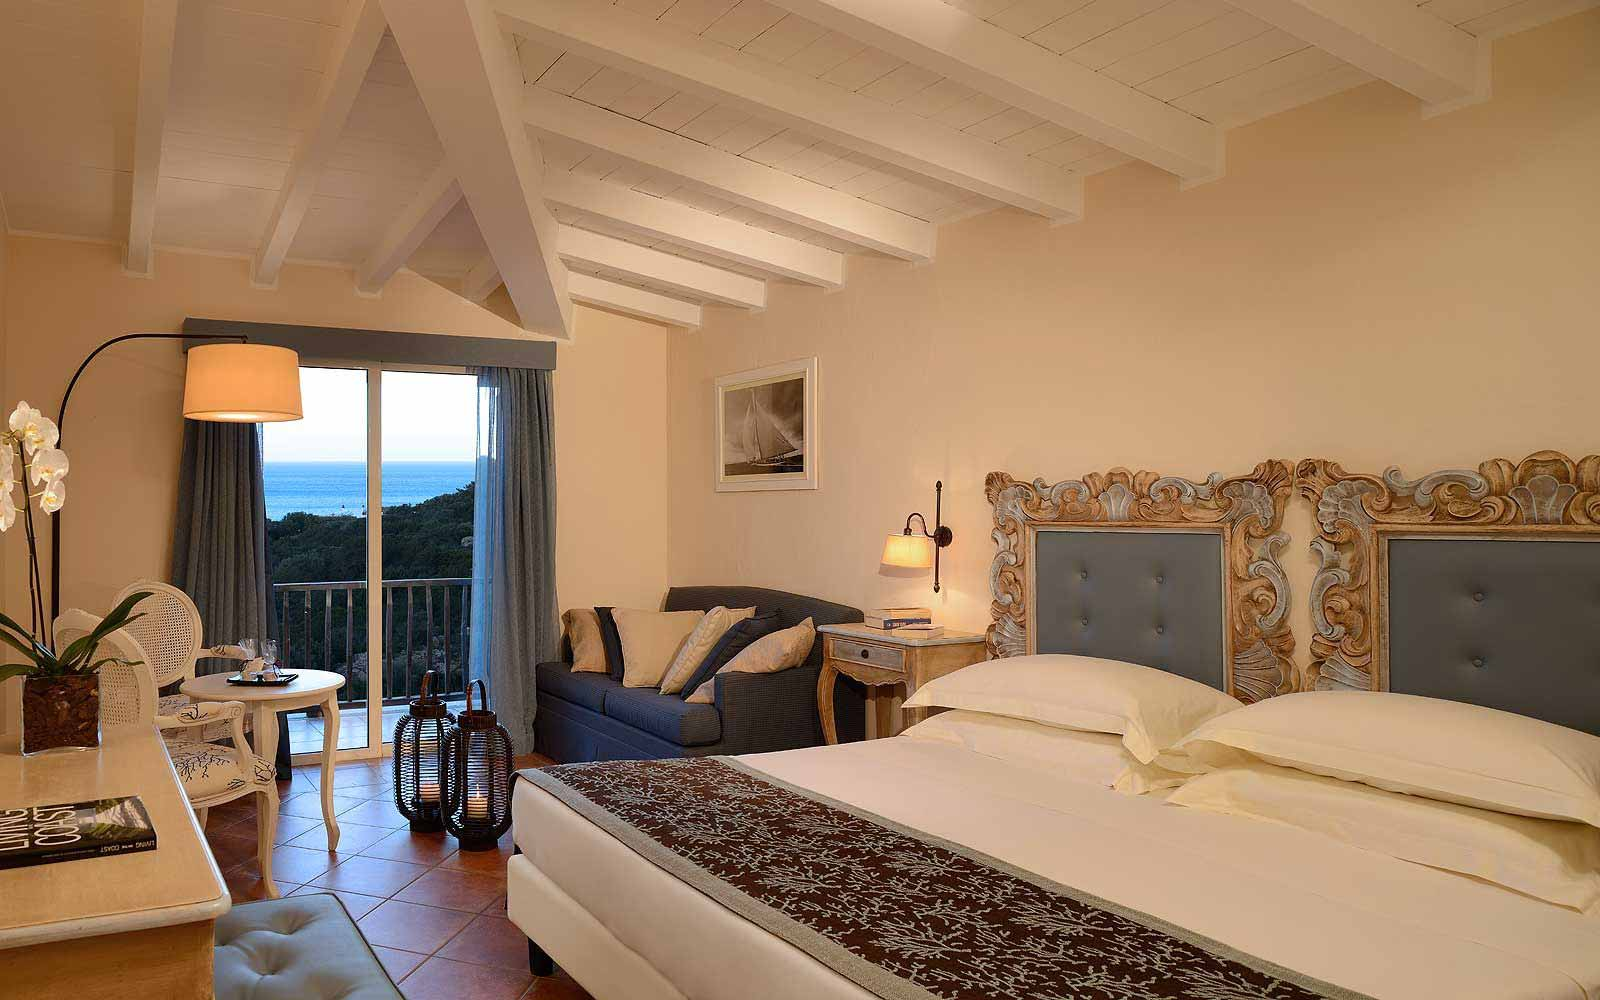 Superior Room at Colonna Pevero Hotel